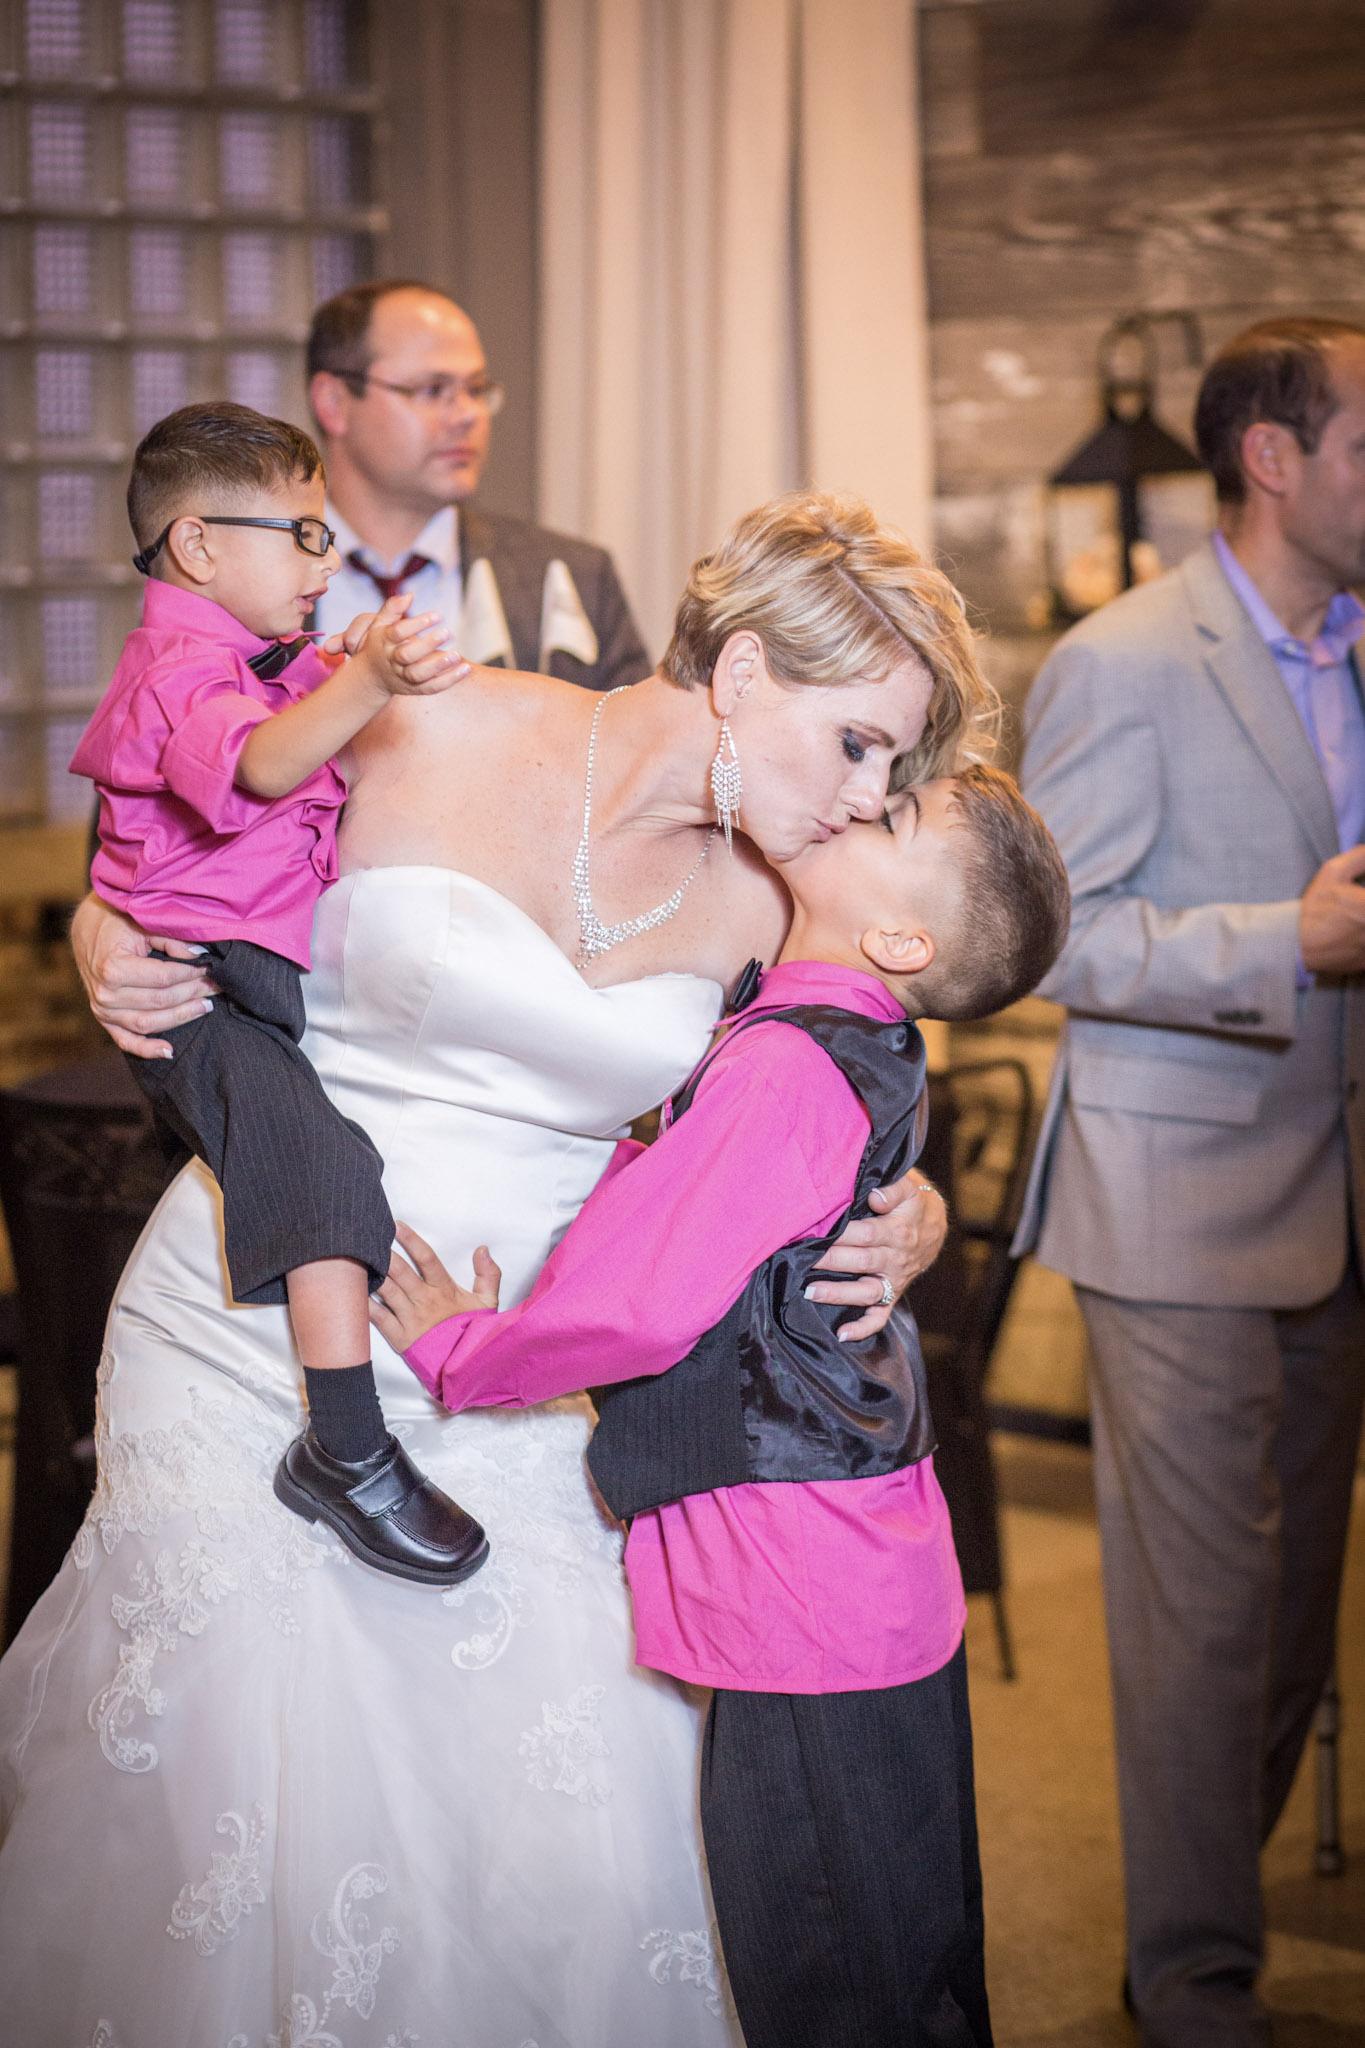 Kansas+City-Small+Wedding-Elope_Intimate_Ceremony_Mother's+Day_9.jpg